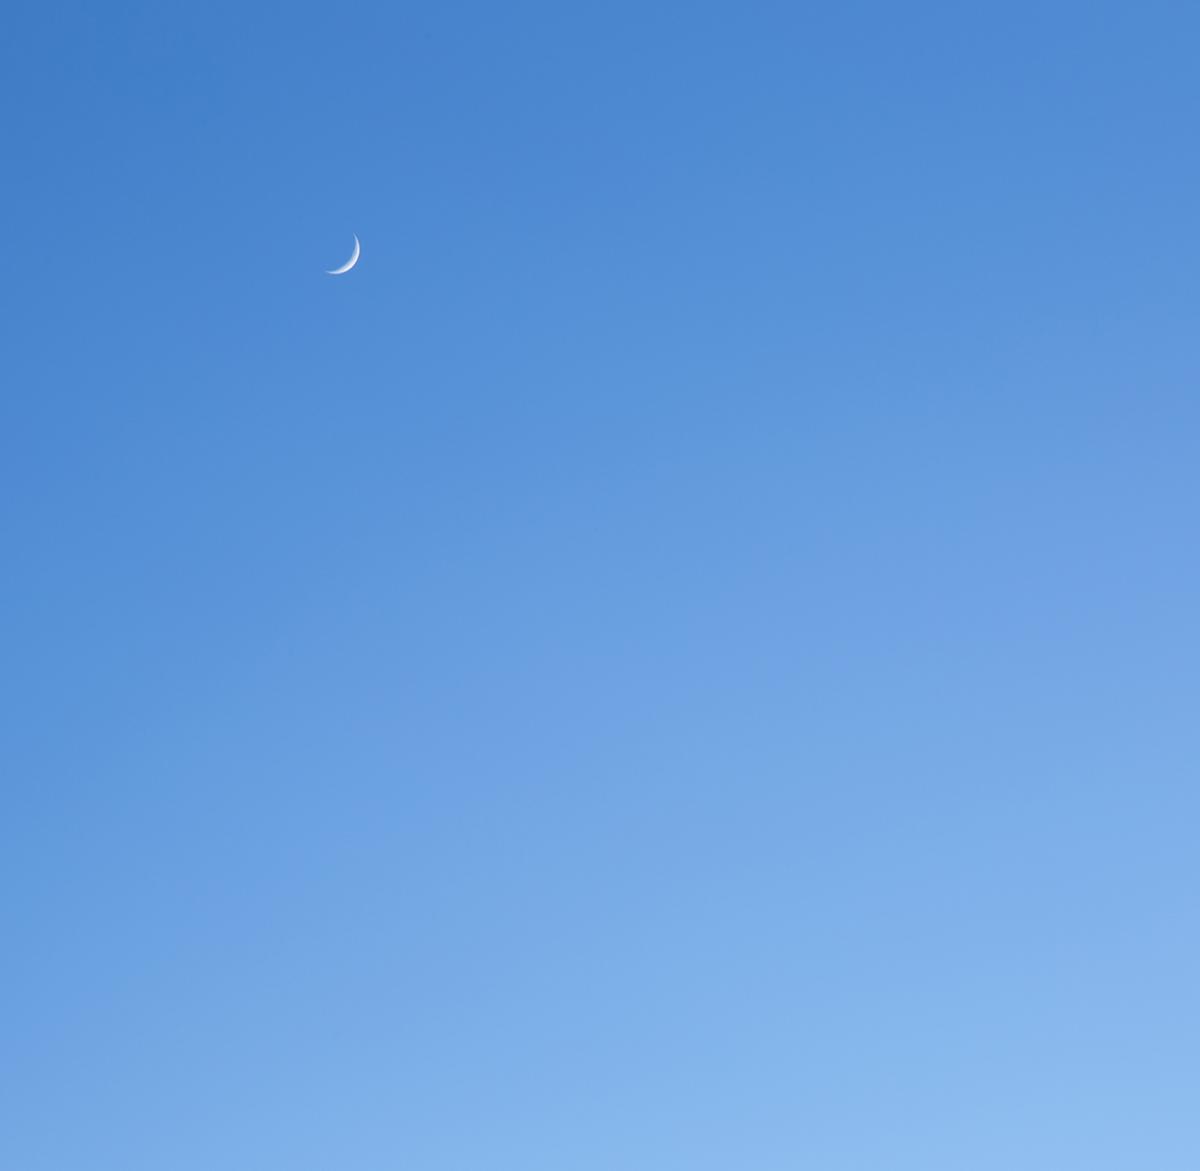 006 Skyscapes_4thJan2014LastLightHarford-3